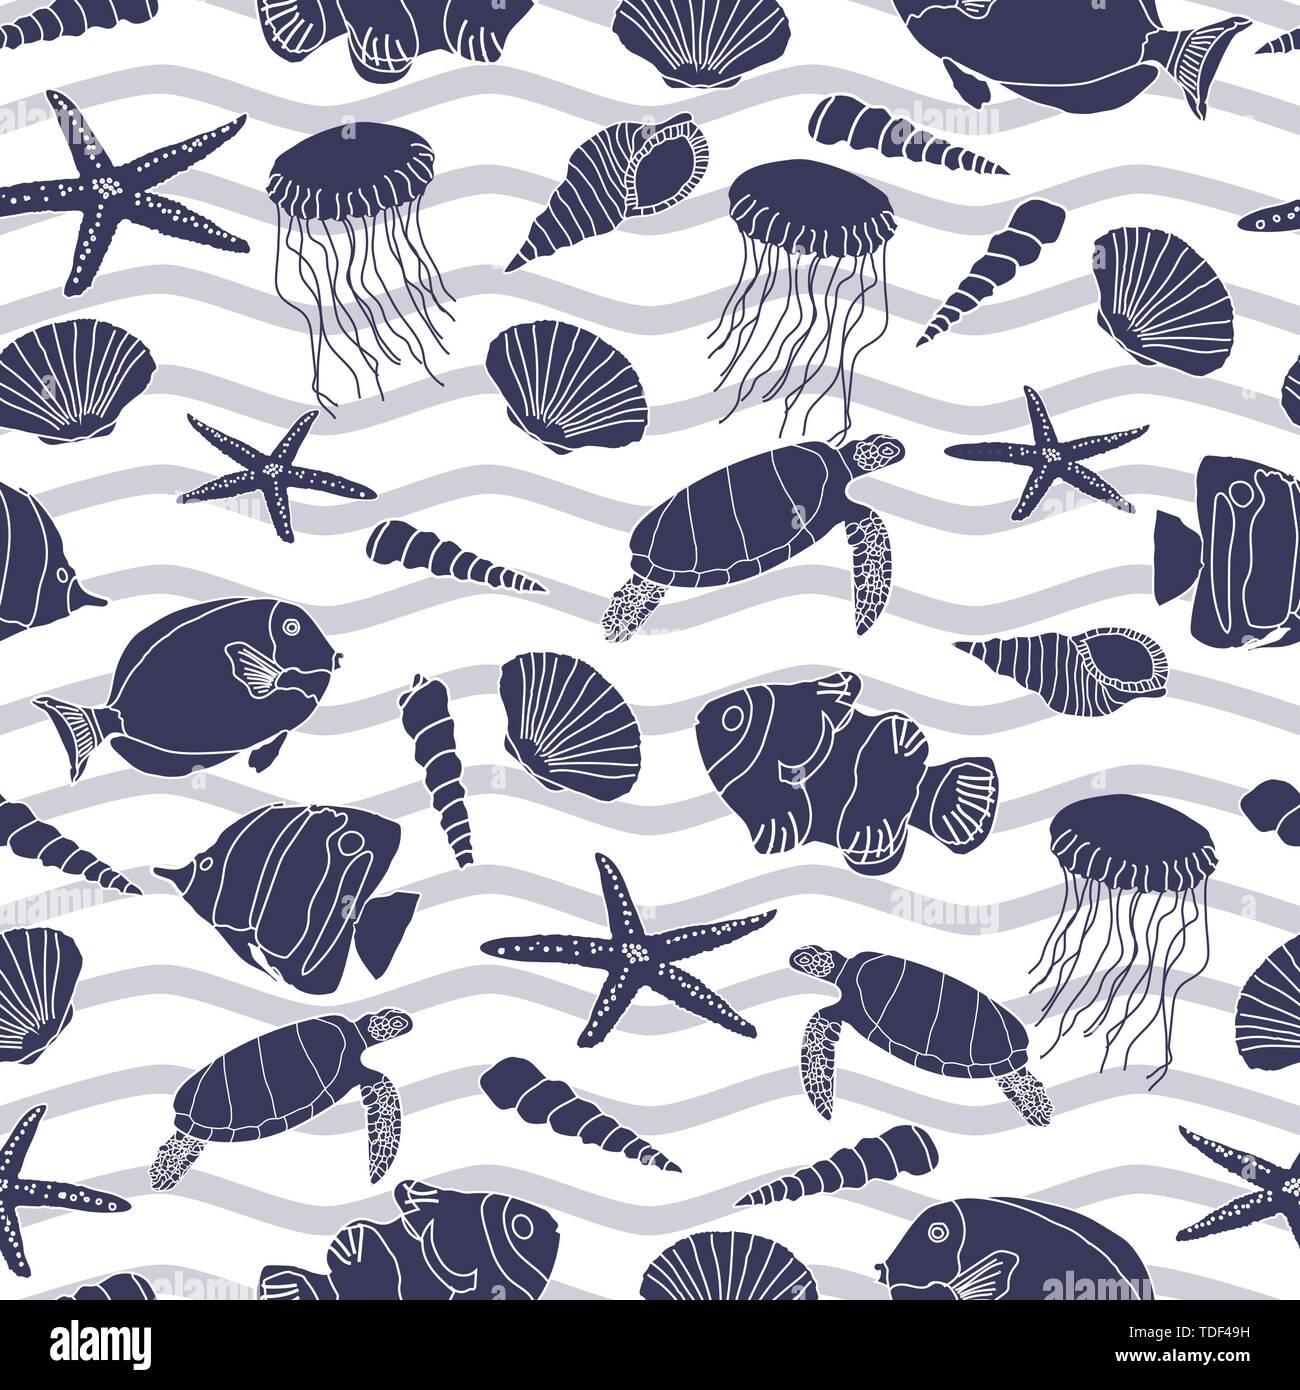 Cute hand drawn sea life seamless pattern background. - Stock Image